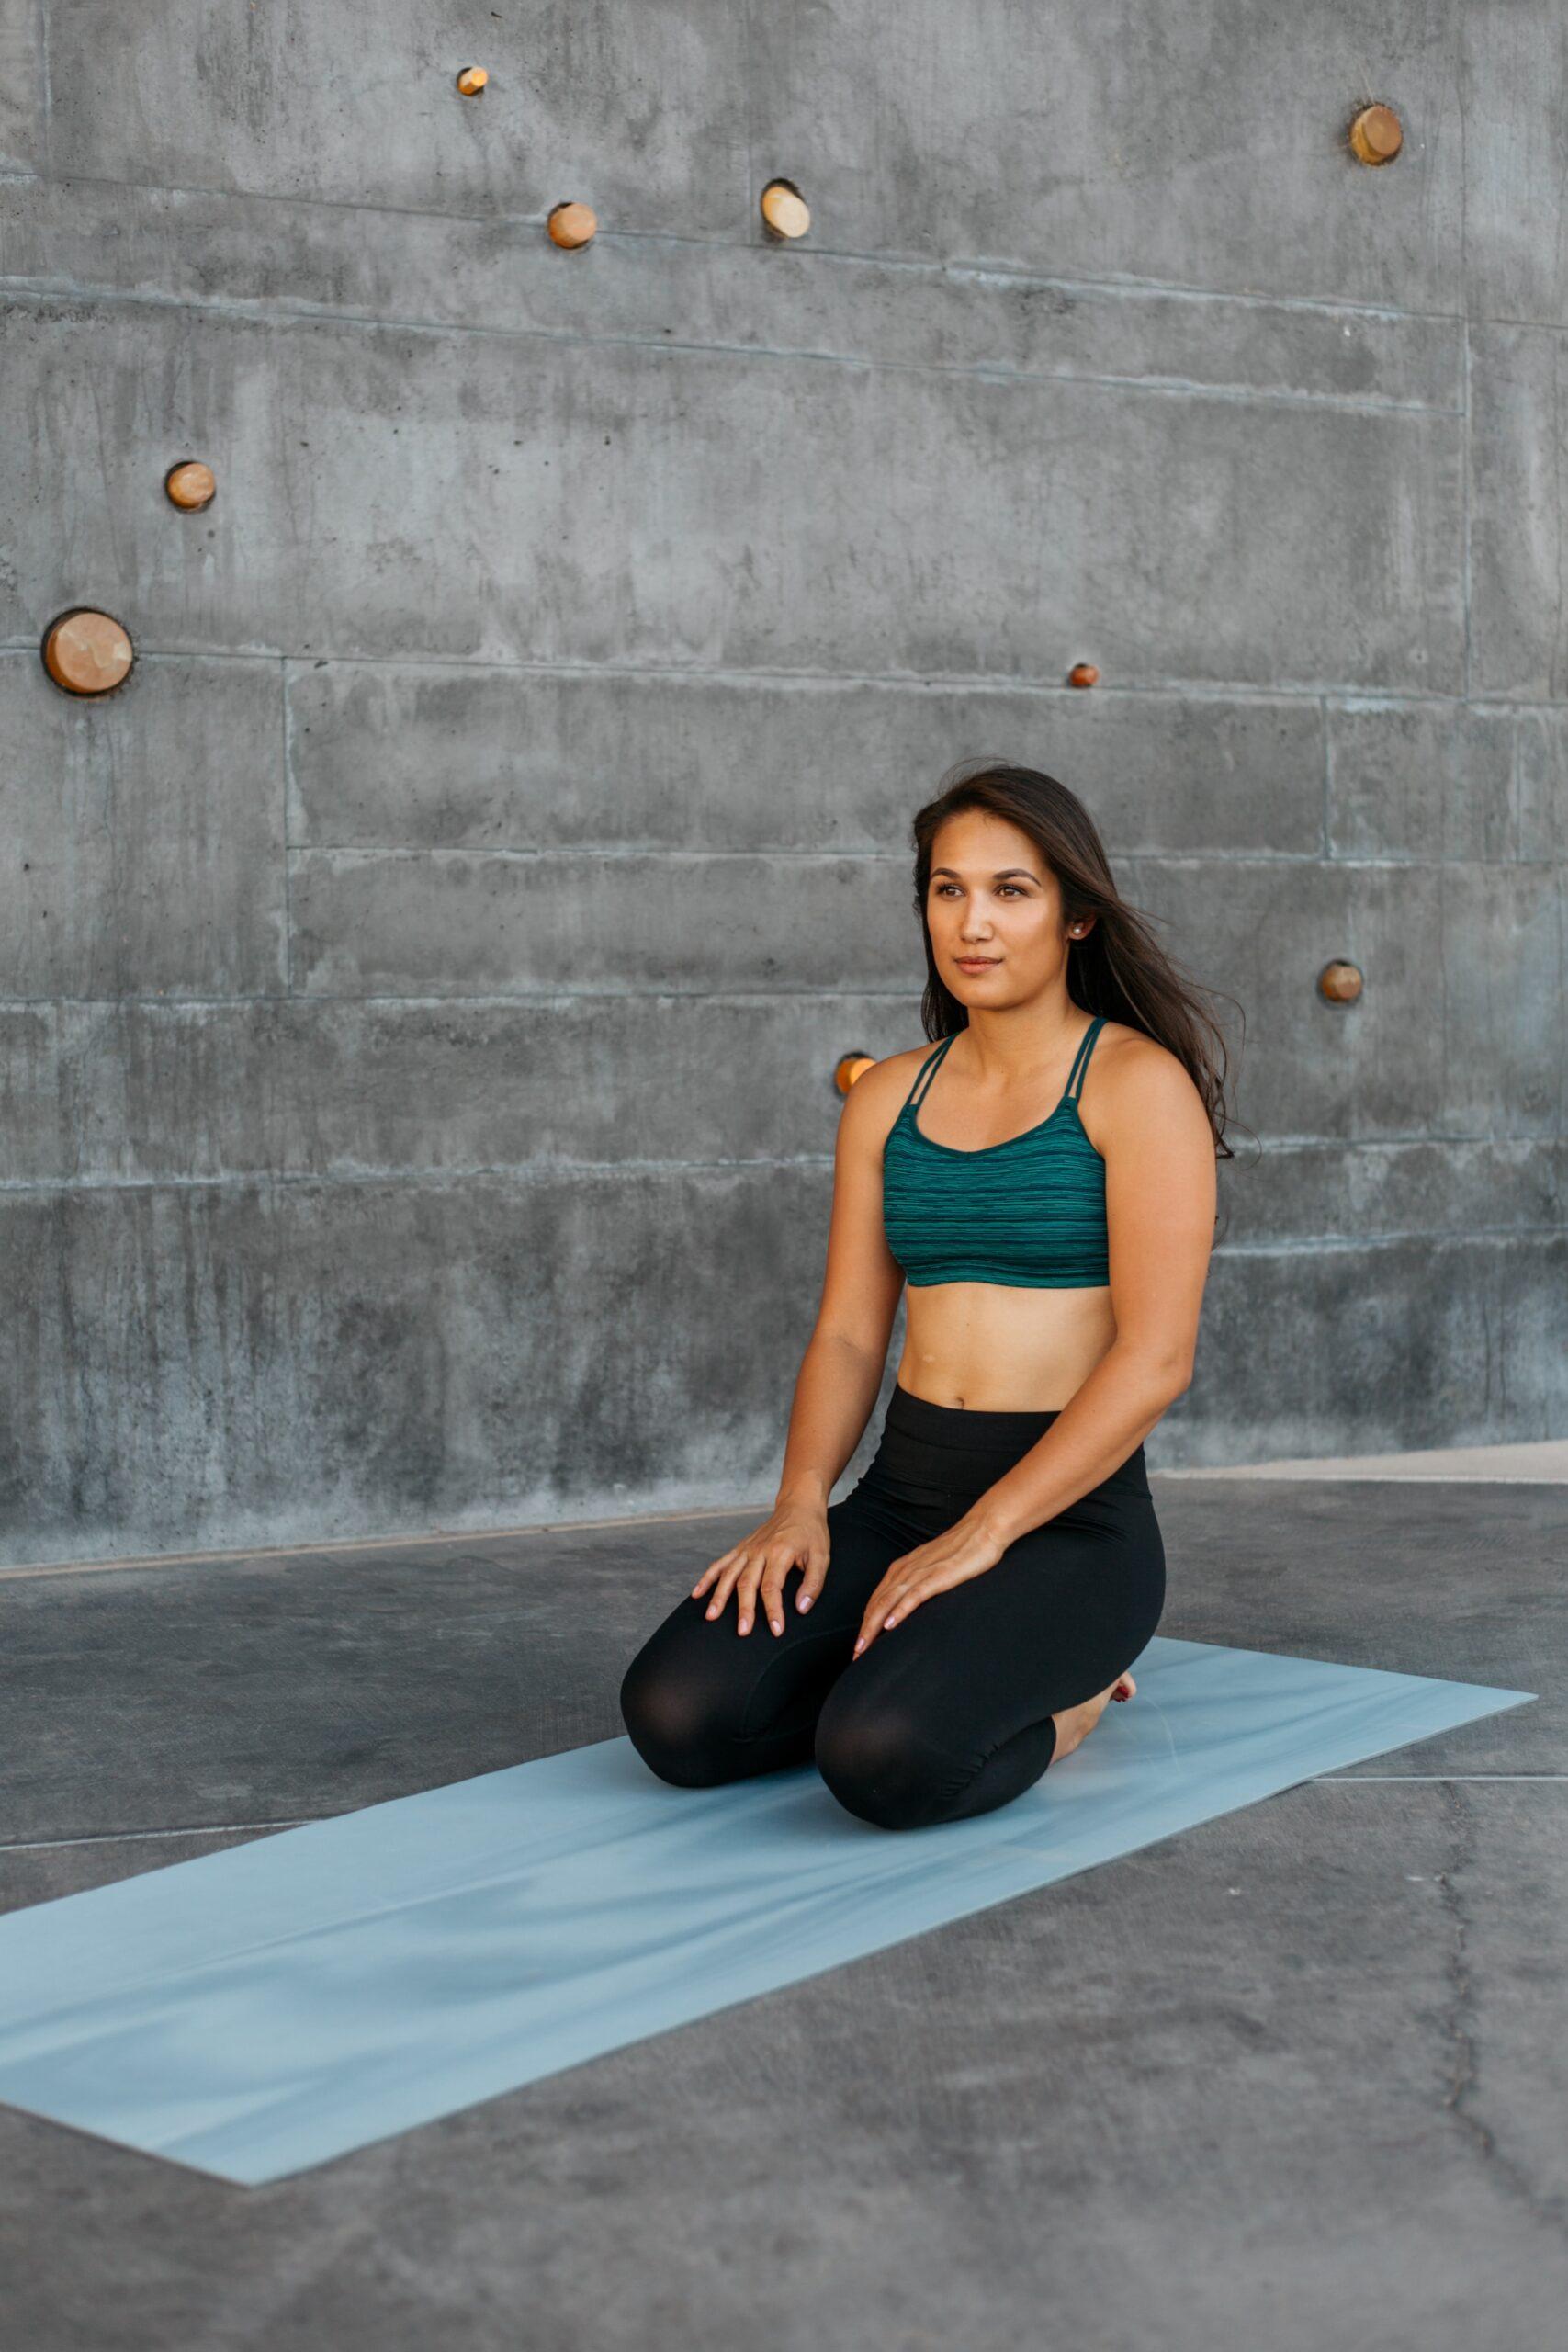 woman on yoga mat